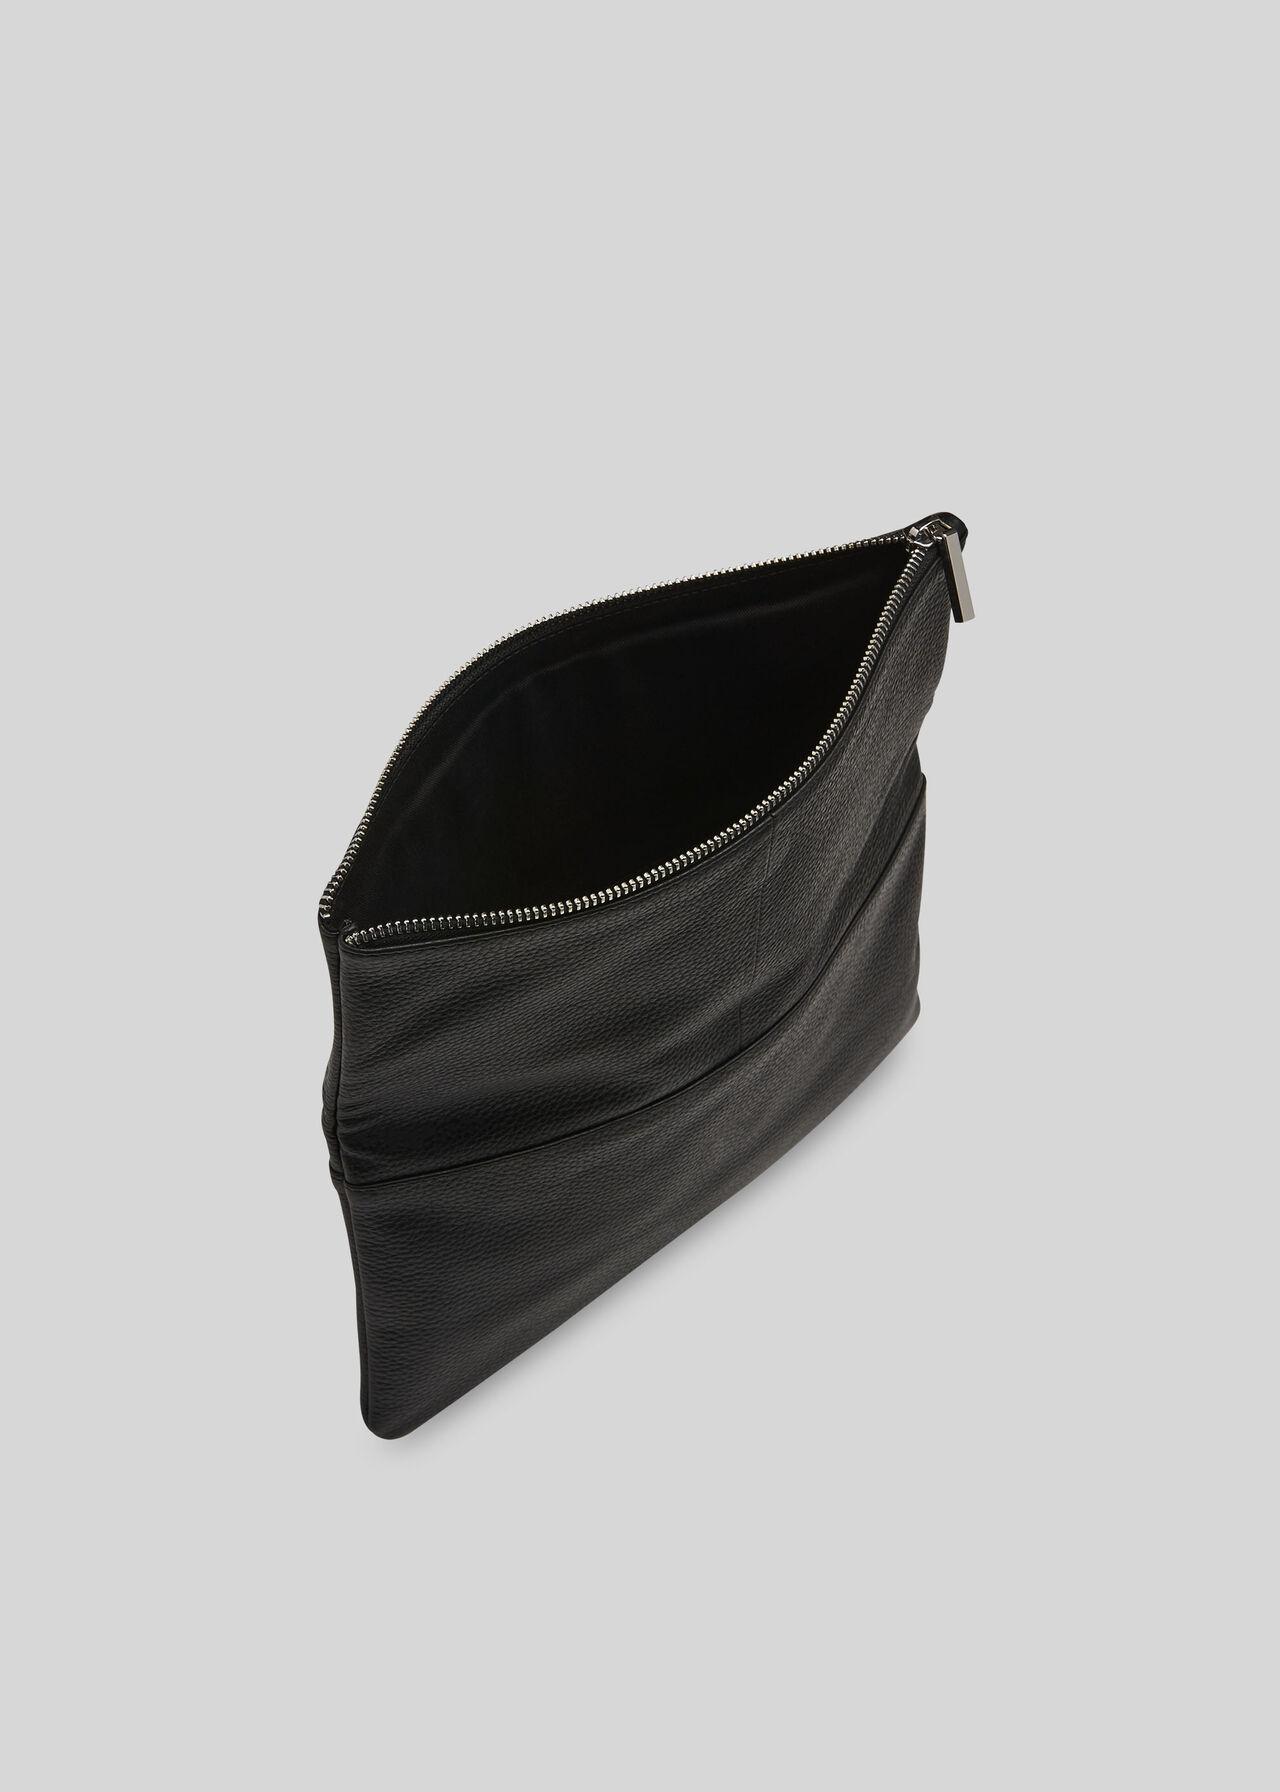 Chapel Foldover Clutch Bag